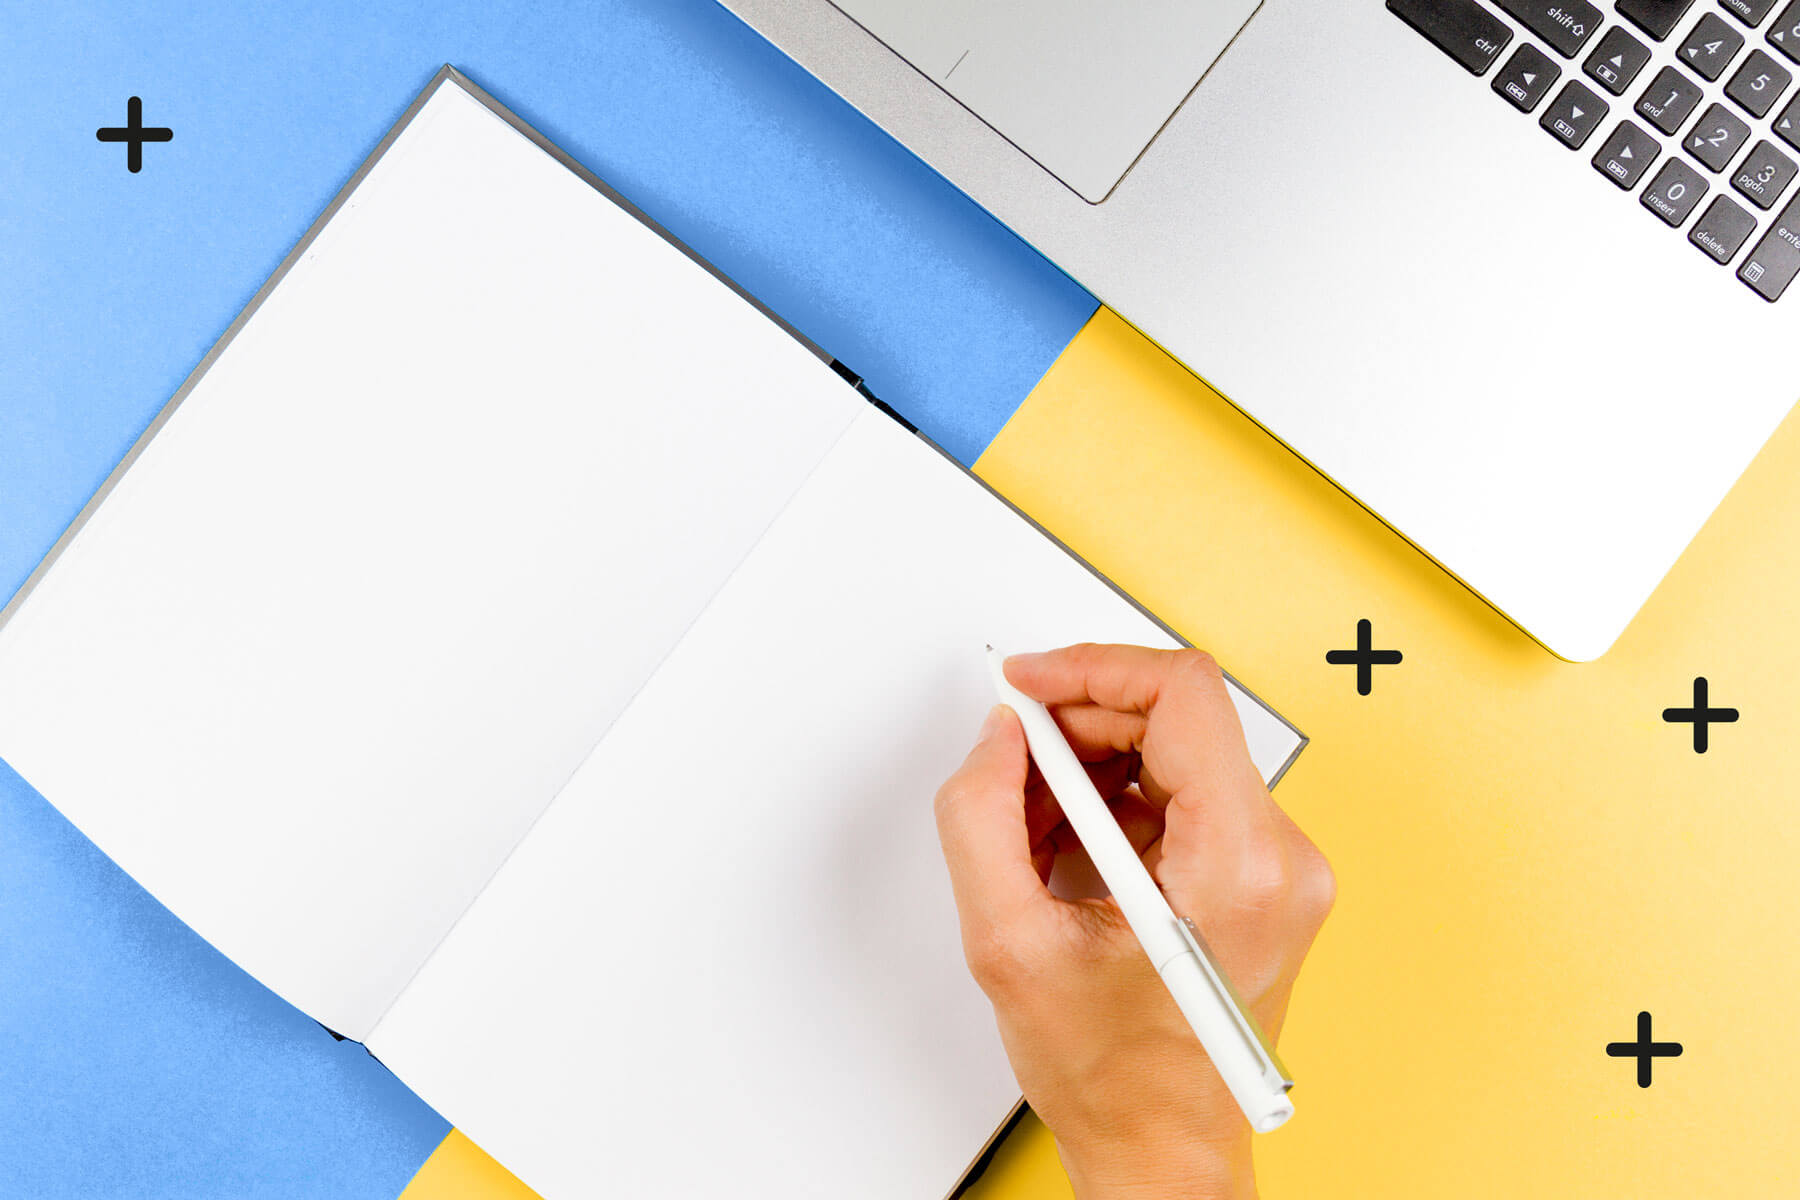 training_creatives_hand-writing_emotion_design.jpg